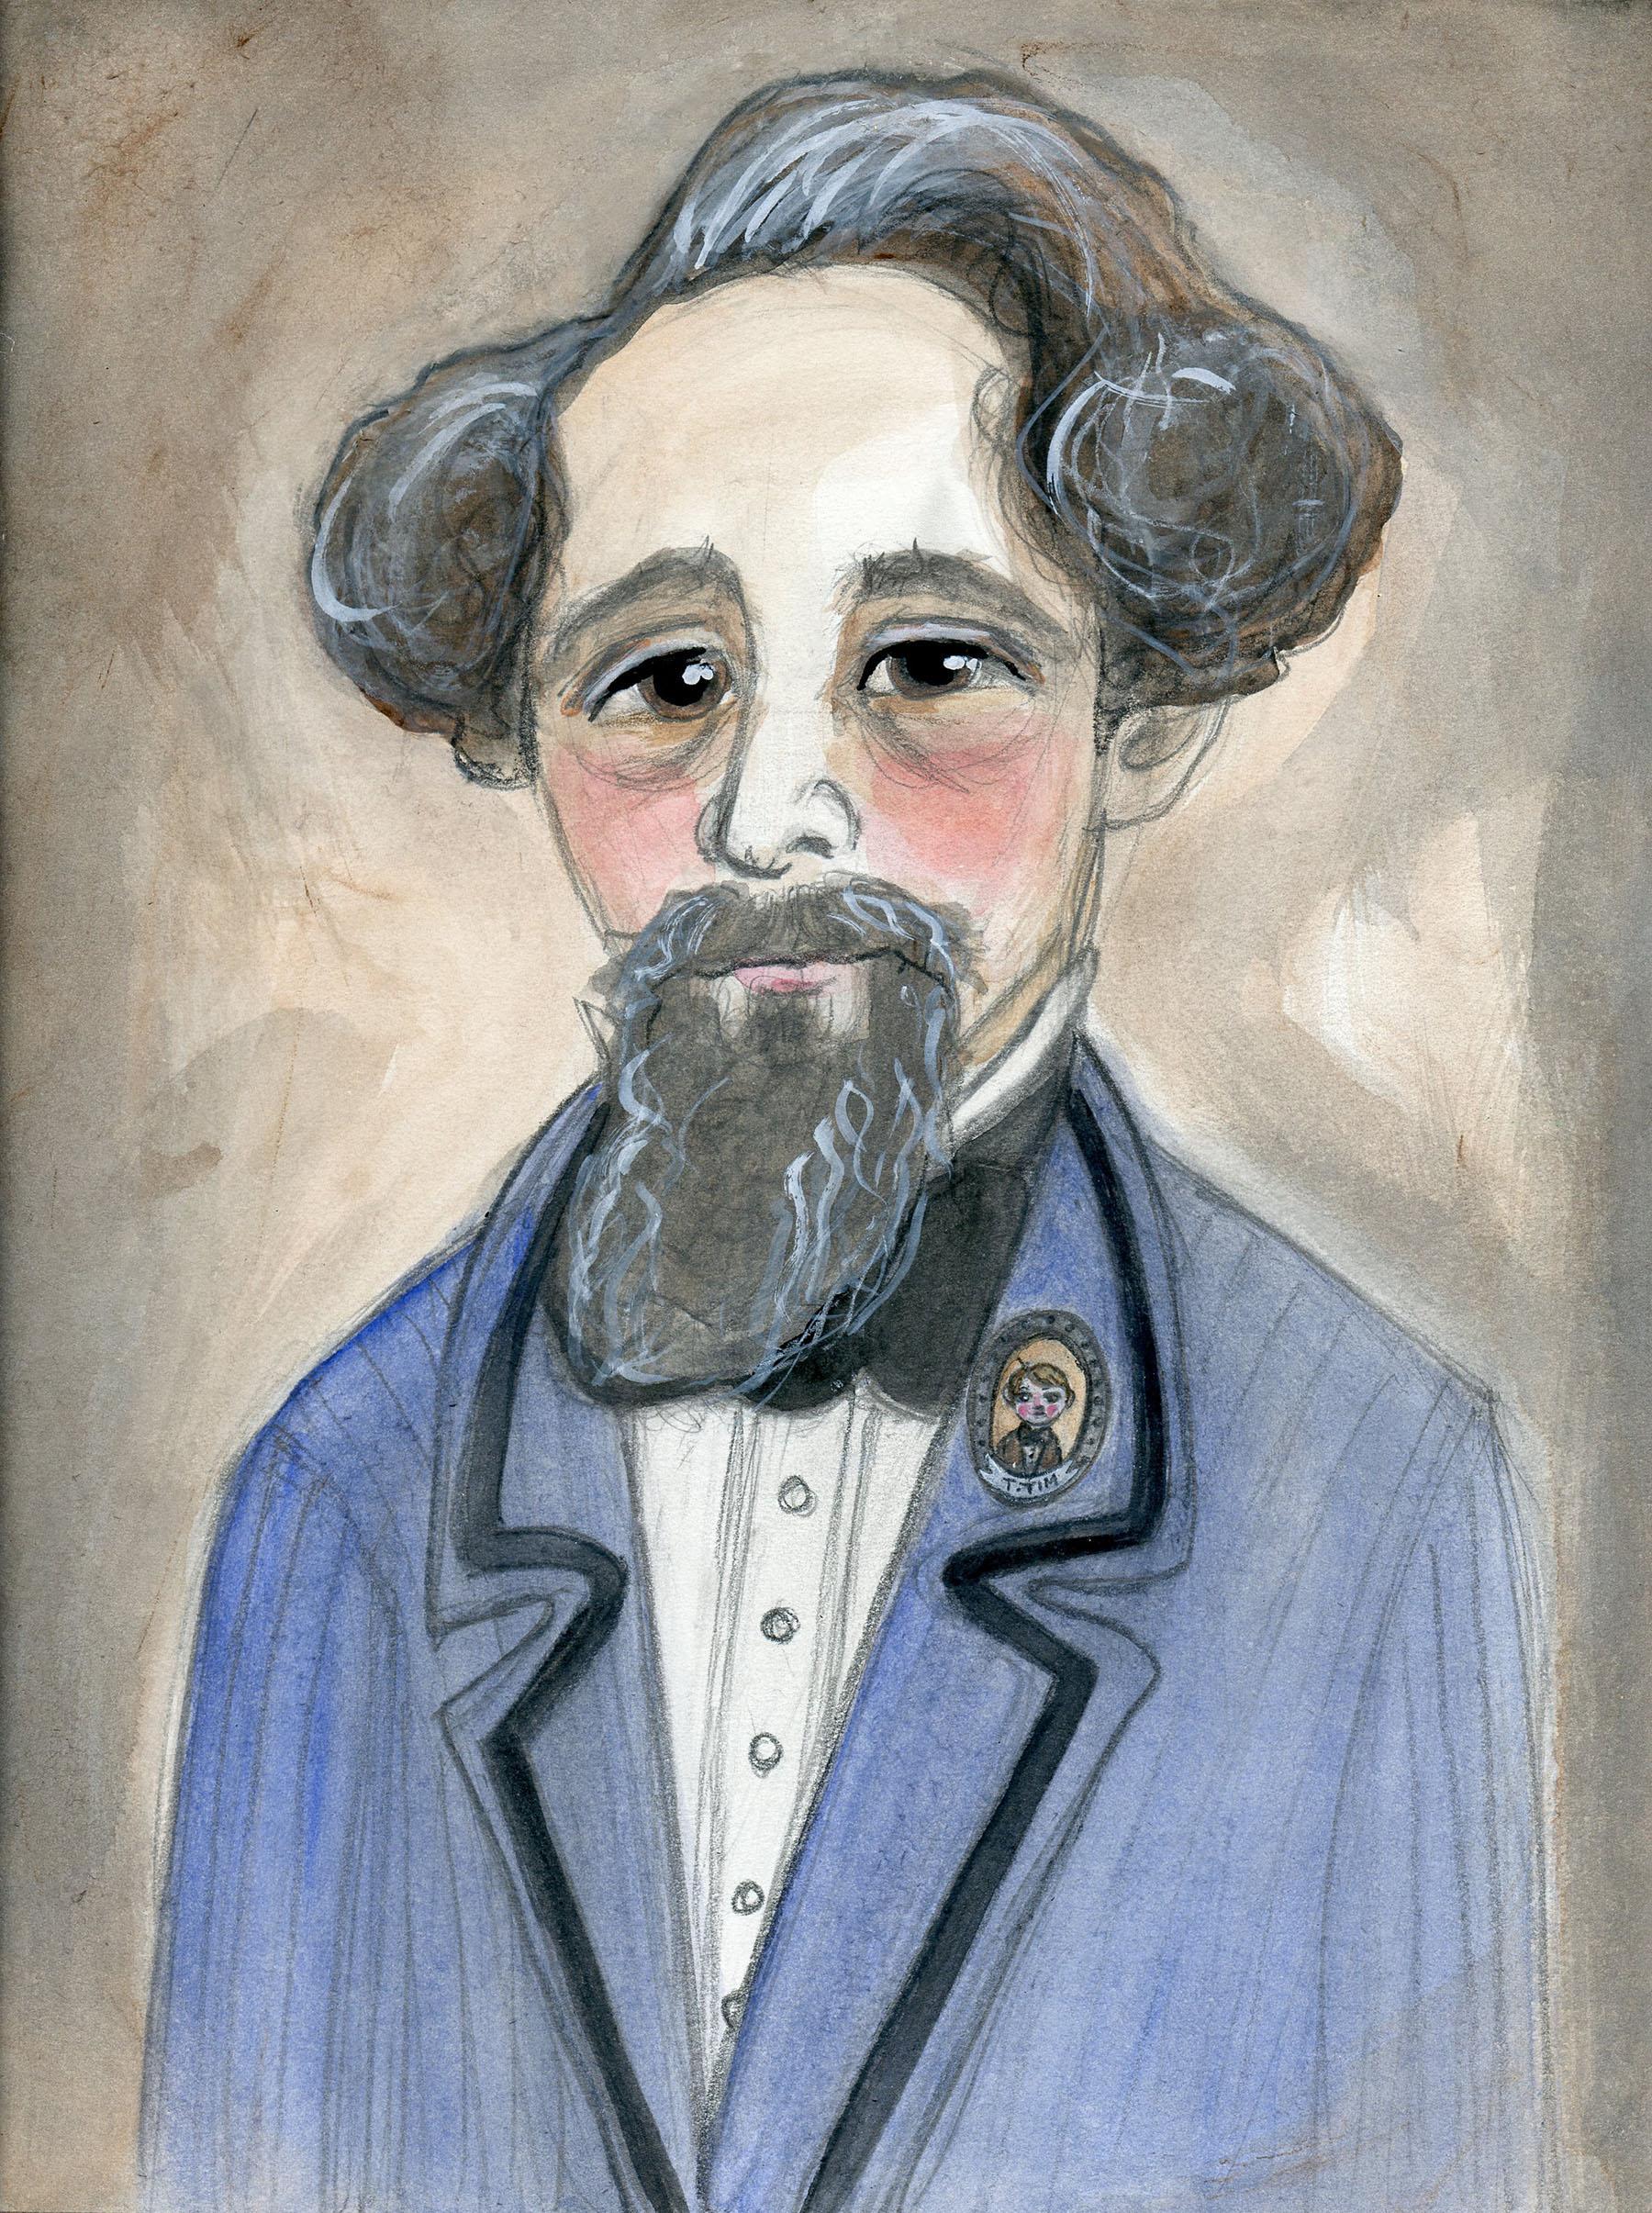 Charles Dickens in Blue